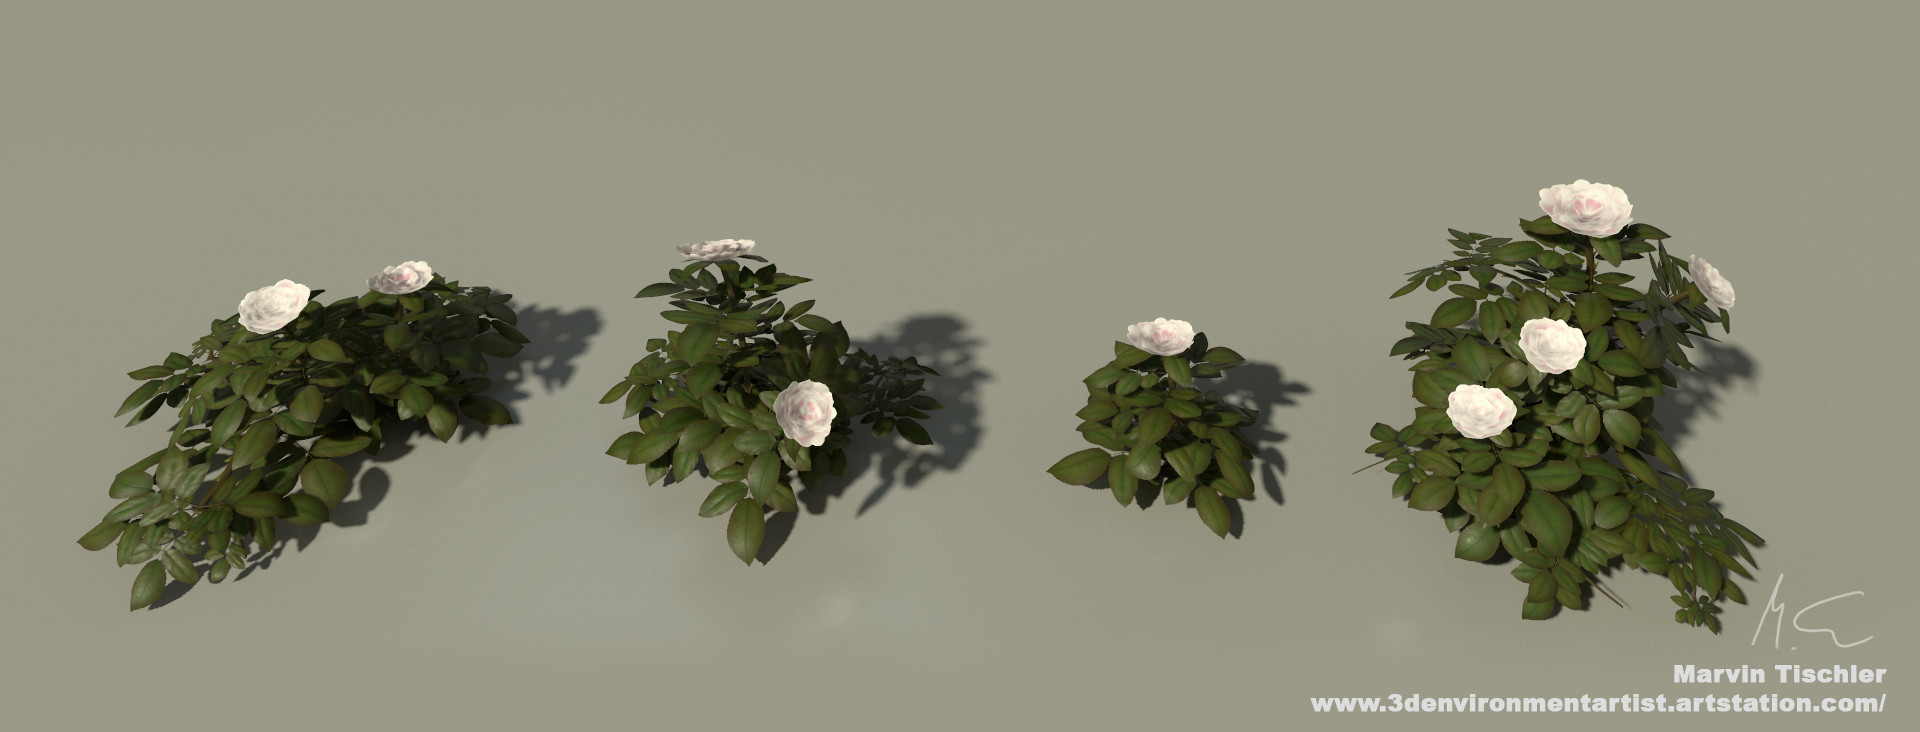 Marvin tischler plants 001 f